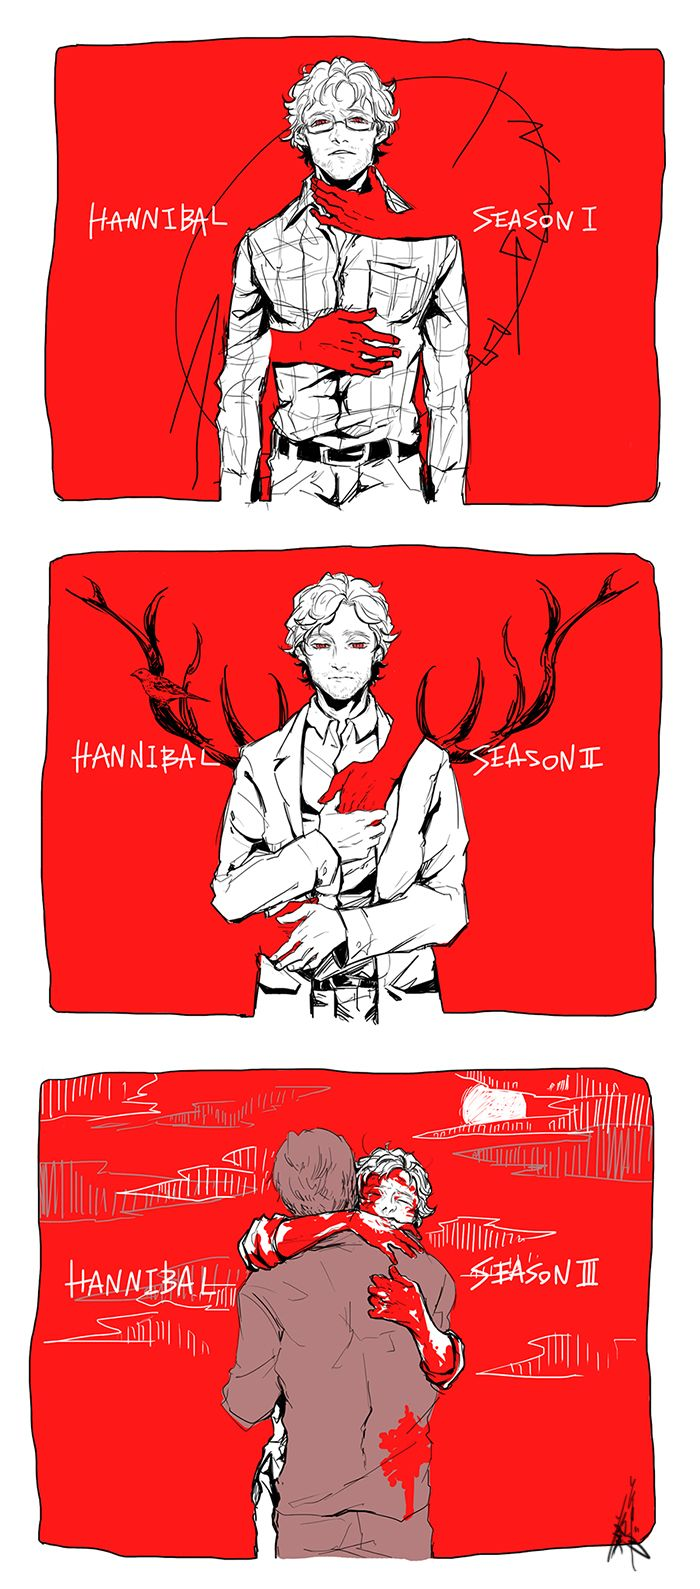 Hannibal fan art. Source: soyogi-bon.tumblr